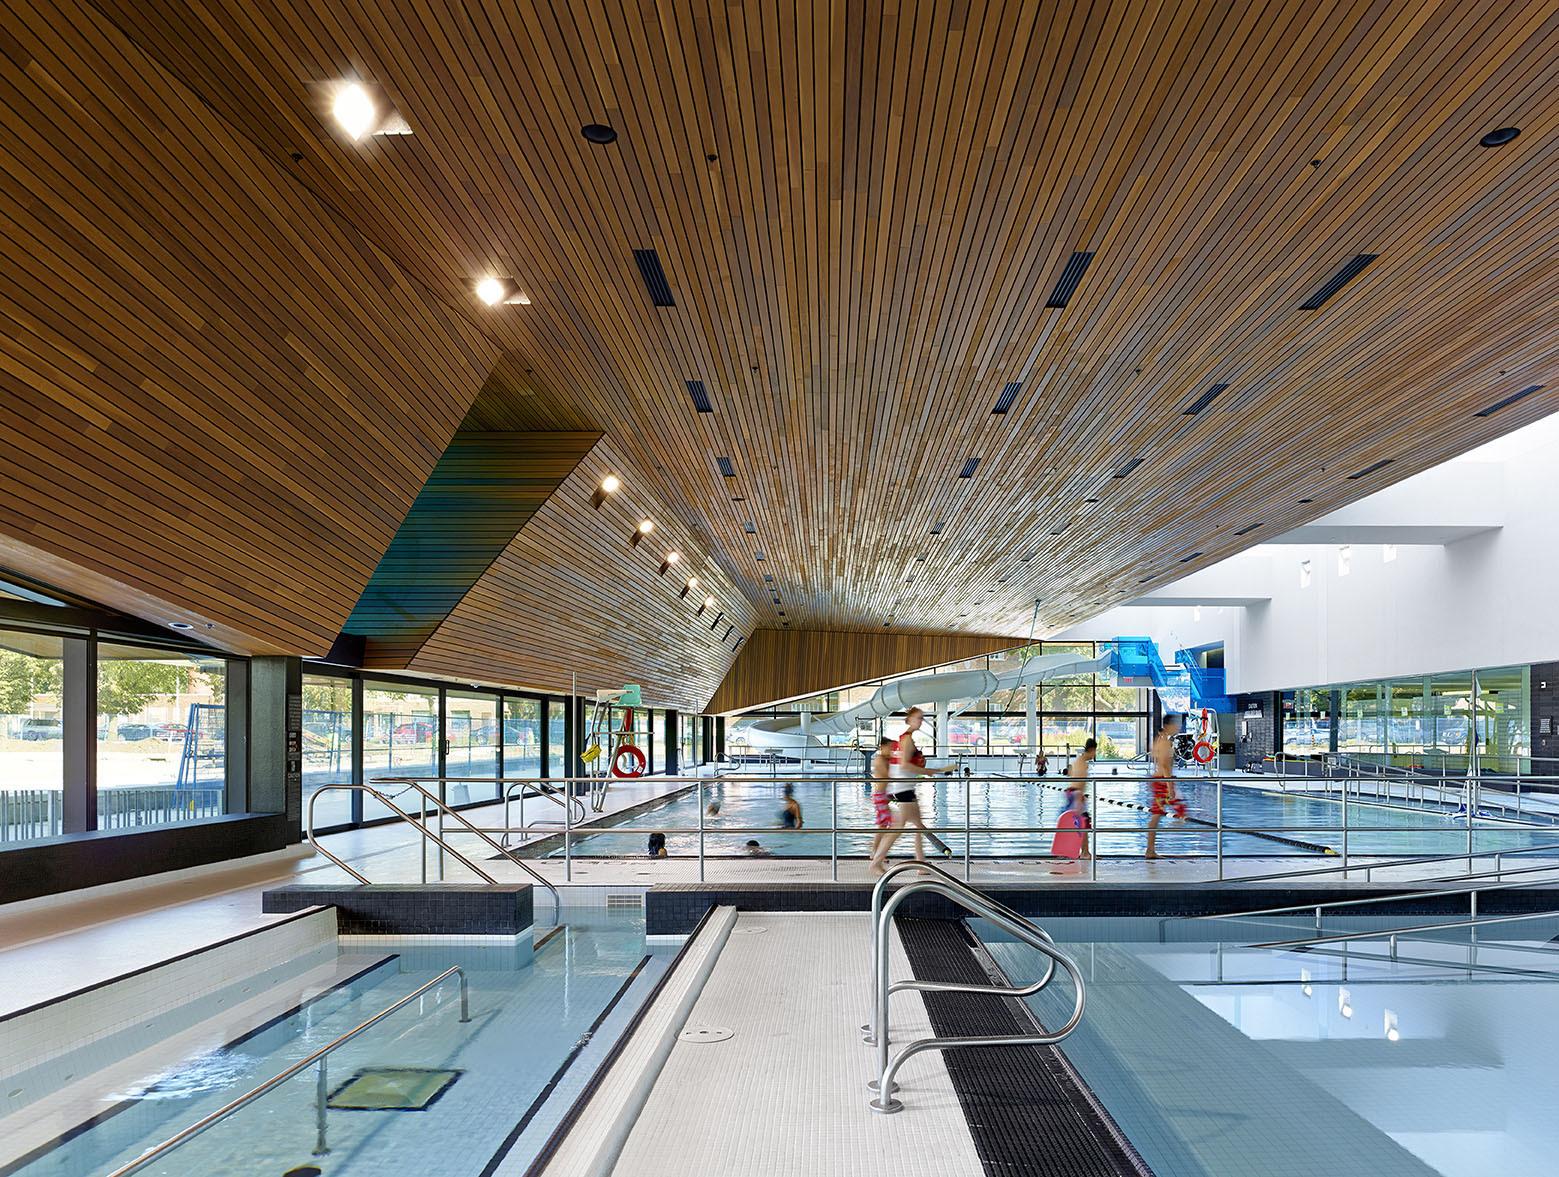 MacLennan Jaunkalns Miller Wins RAICs 2016 Firm Award Regent Park Aquatic Centre